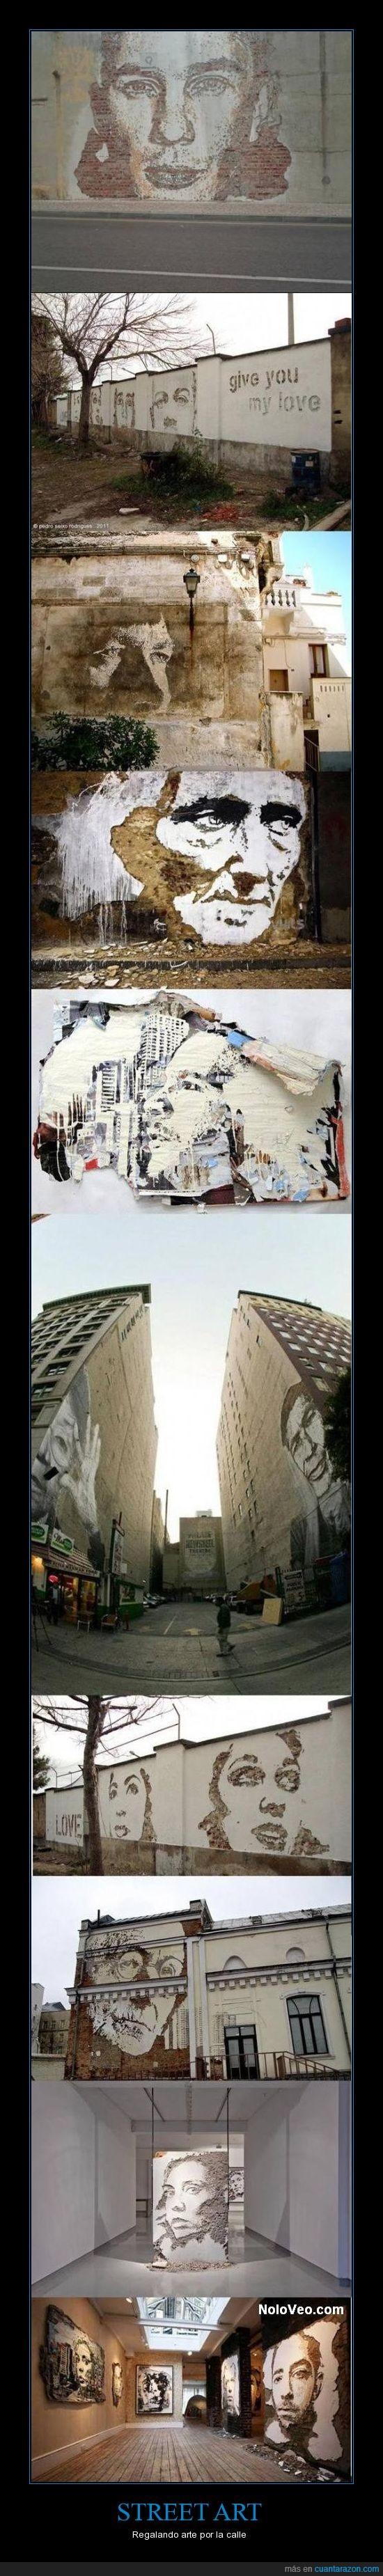 arte,calle,graffiti,pared,pintura